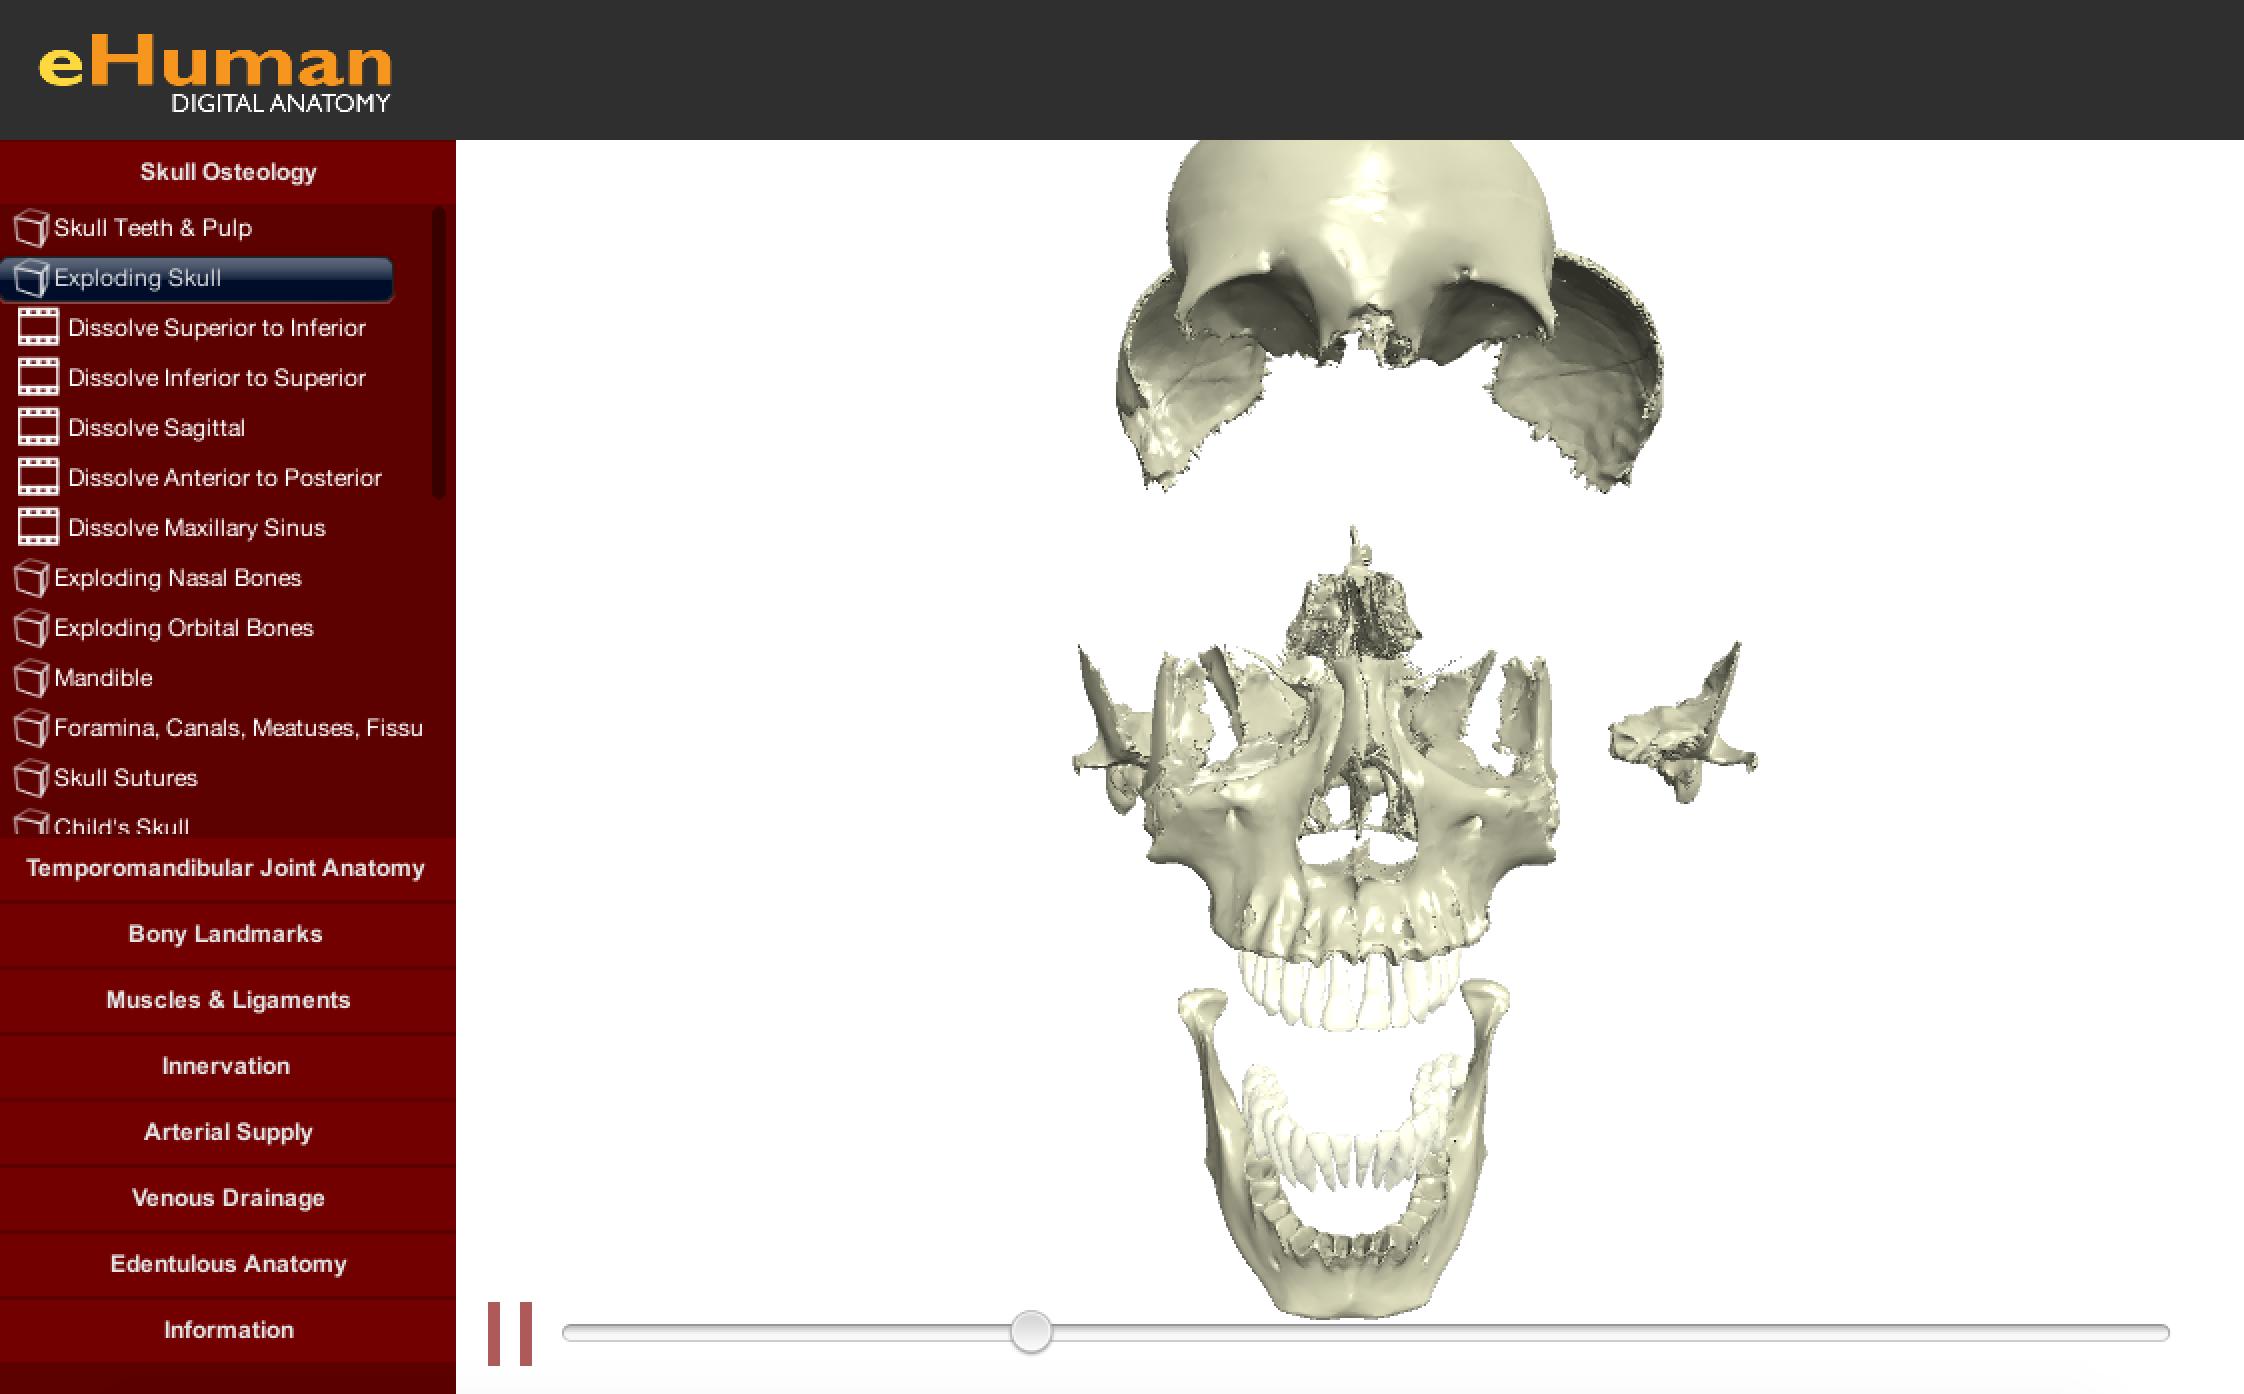 Head and Neck Anatomy | eHuman